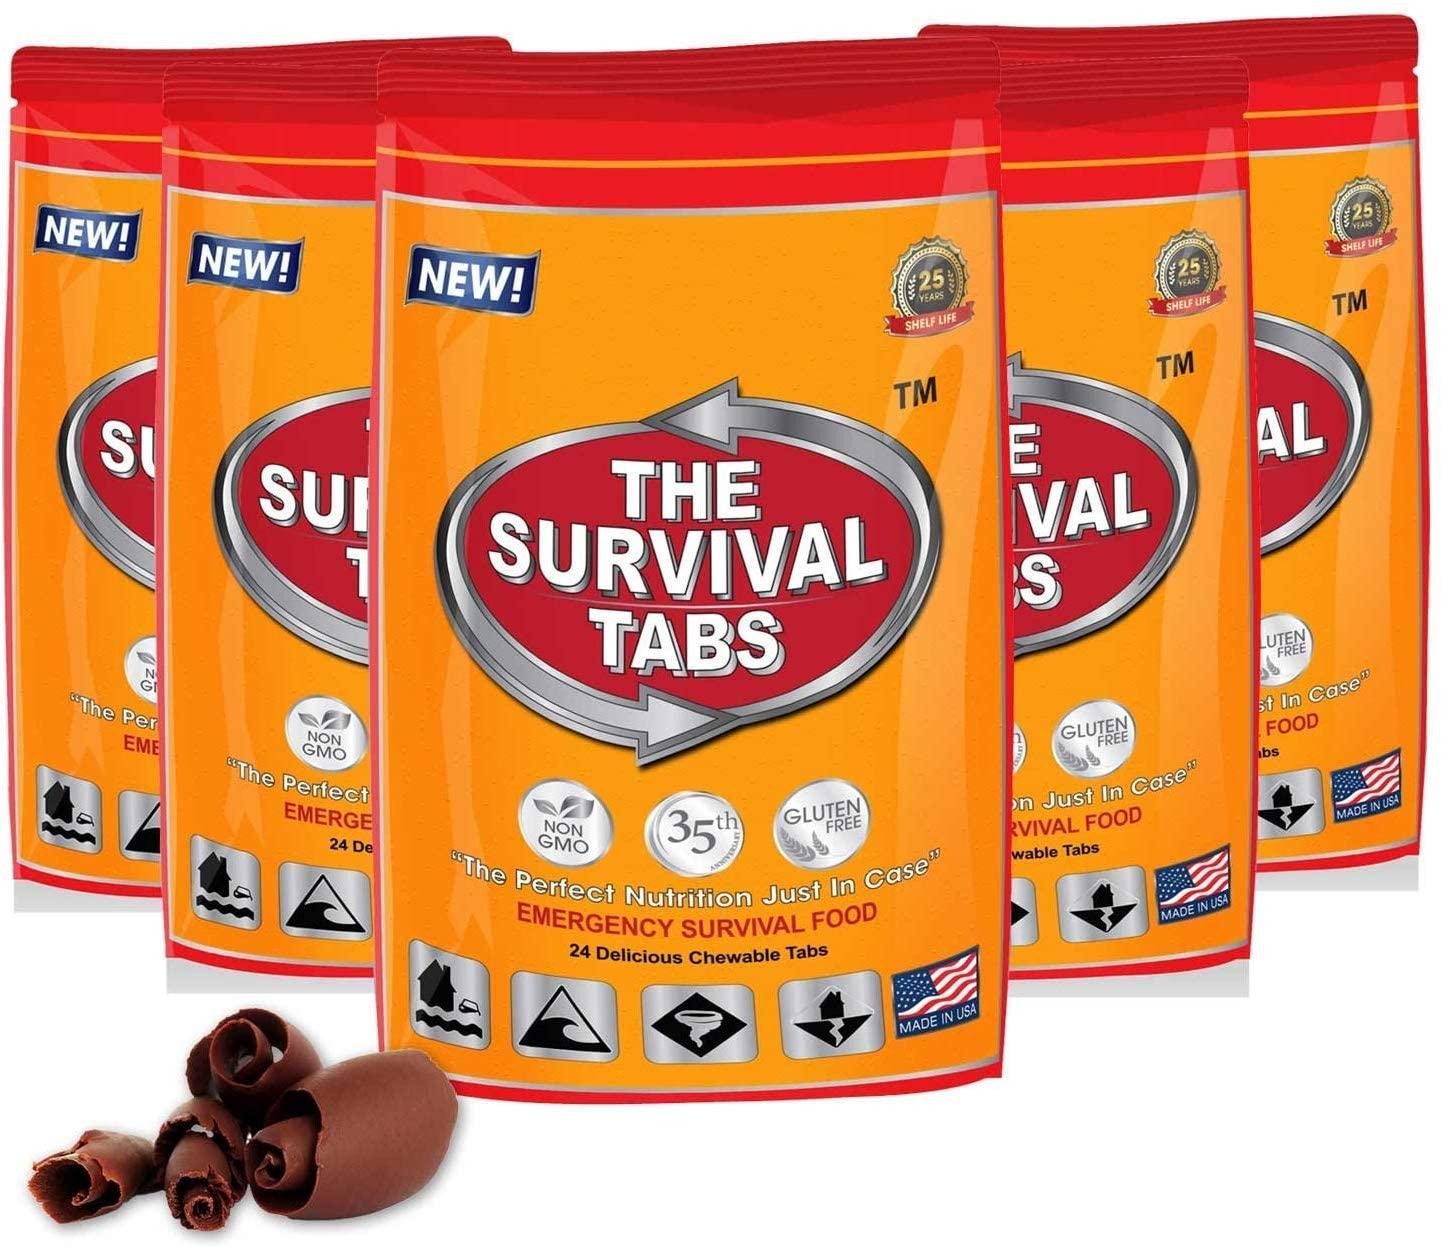 Five packs of The Survival Tabs emergency food supply chocolate tabs